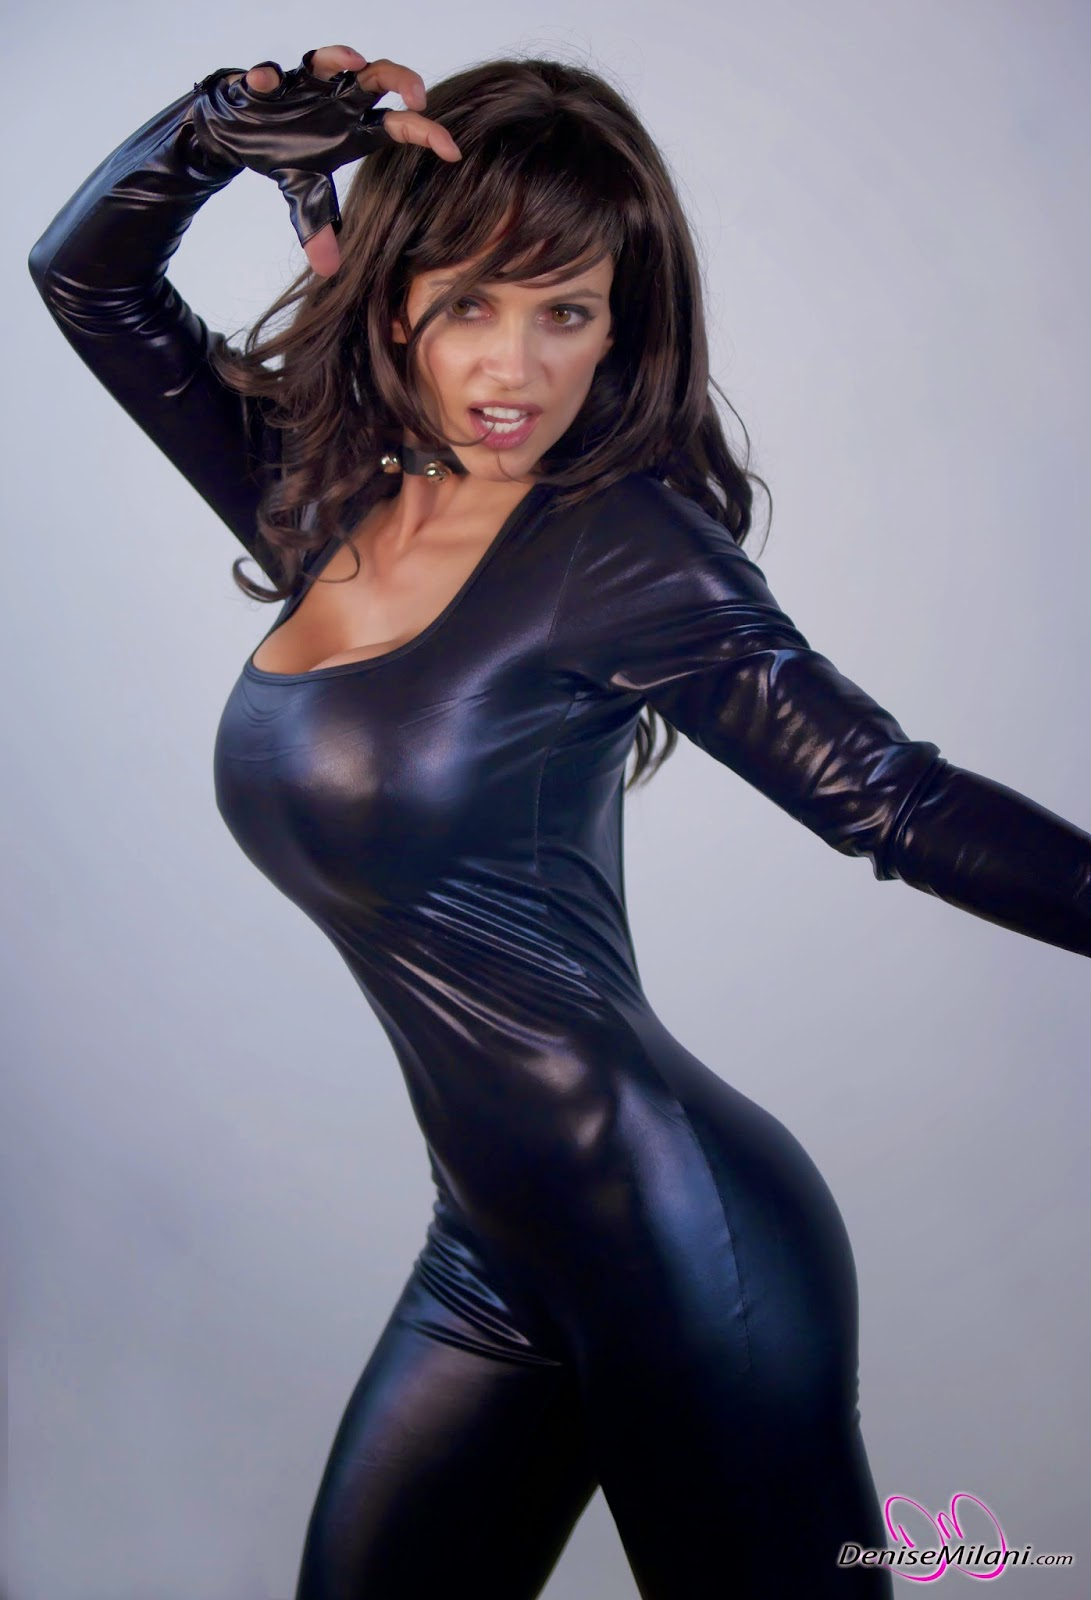 Shiny black catsuit